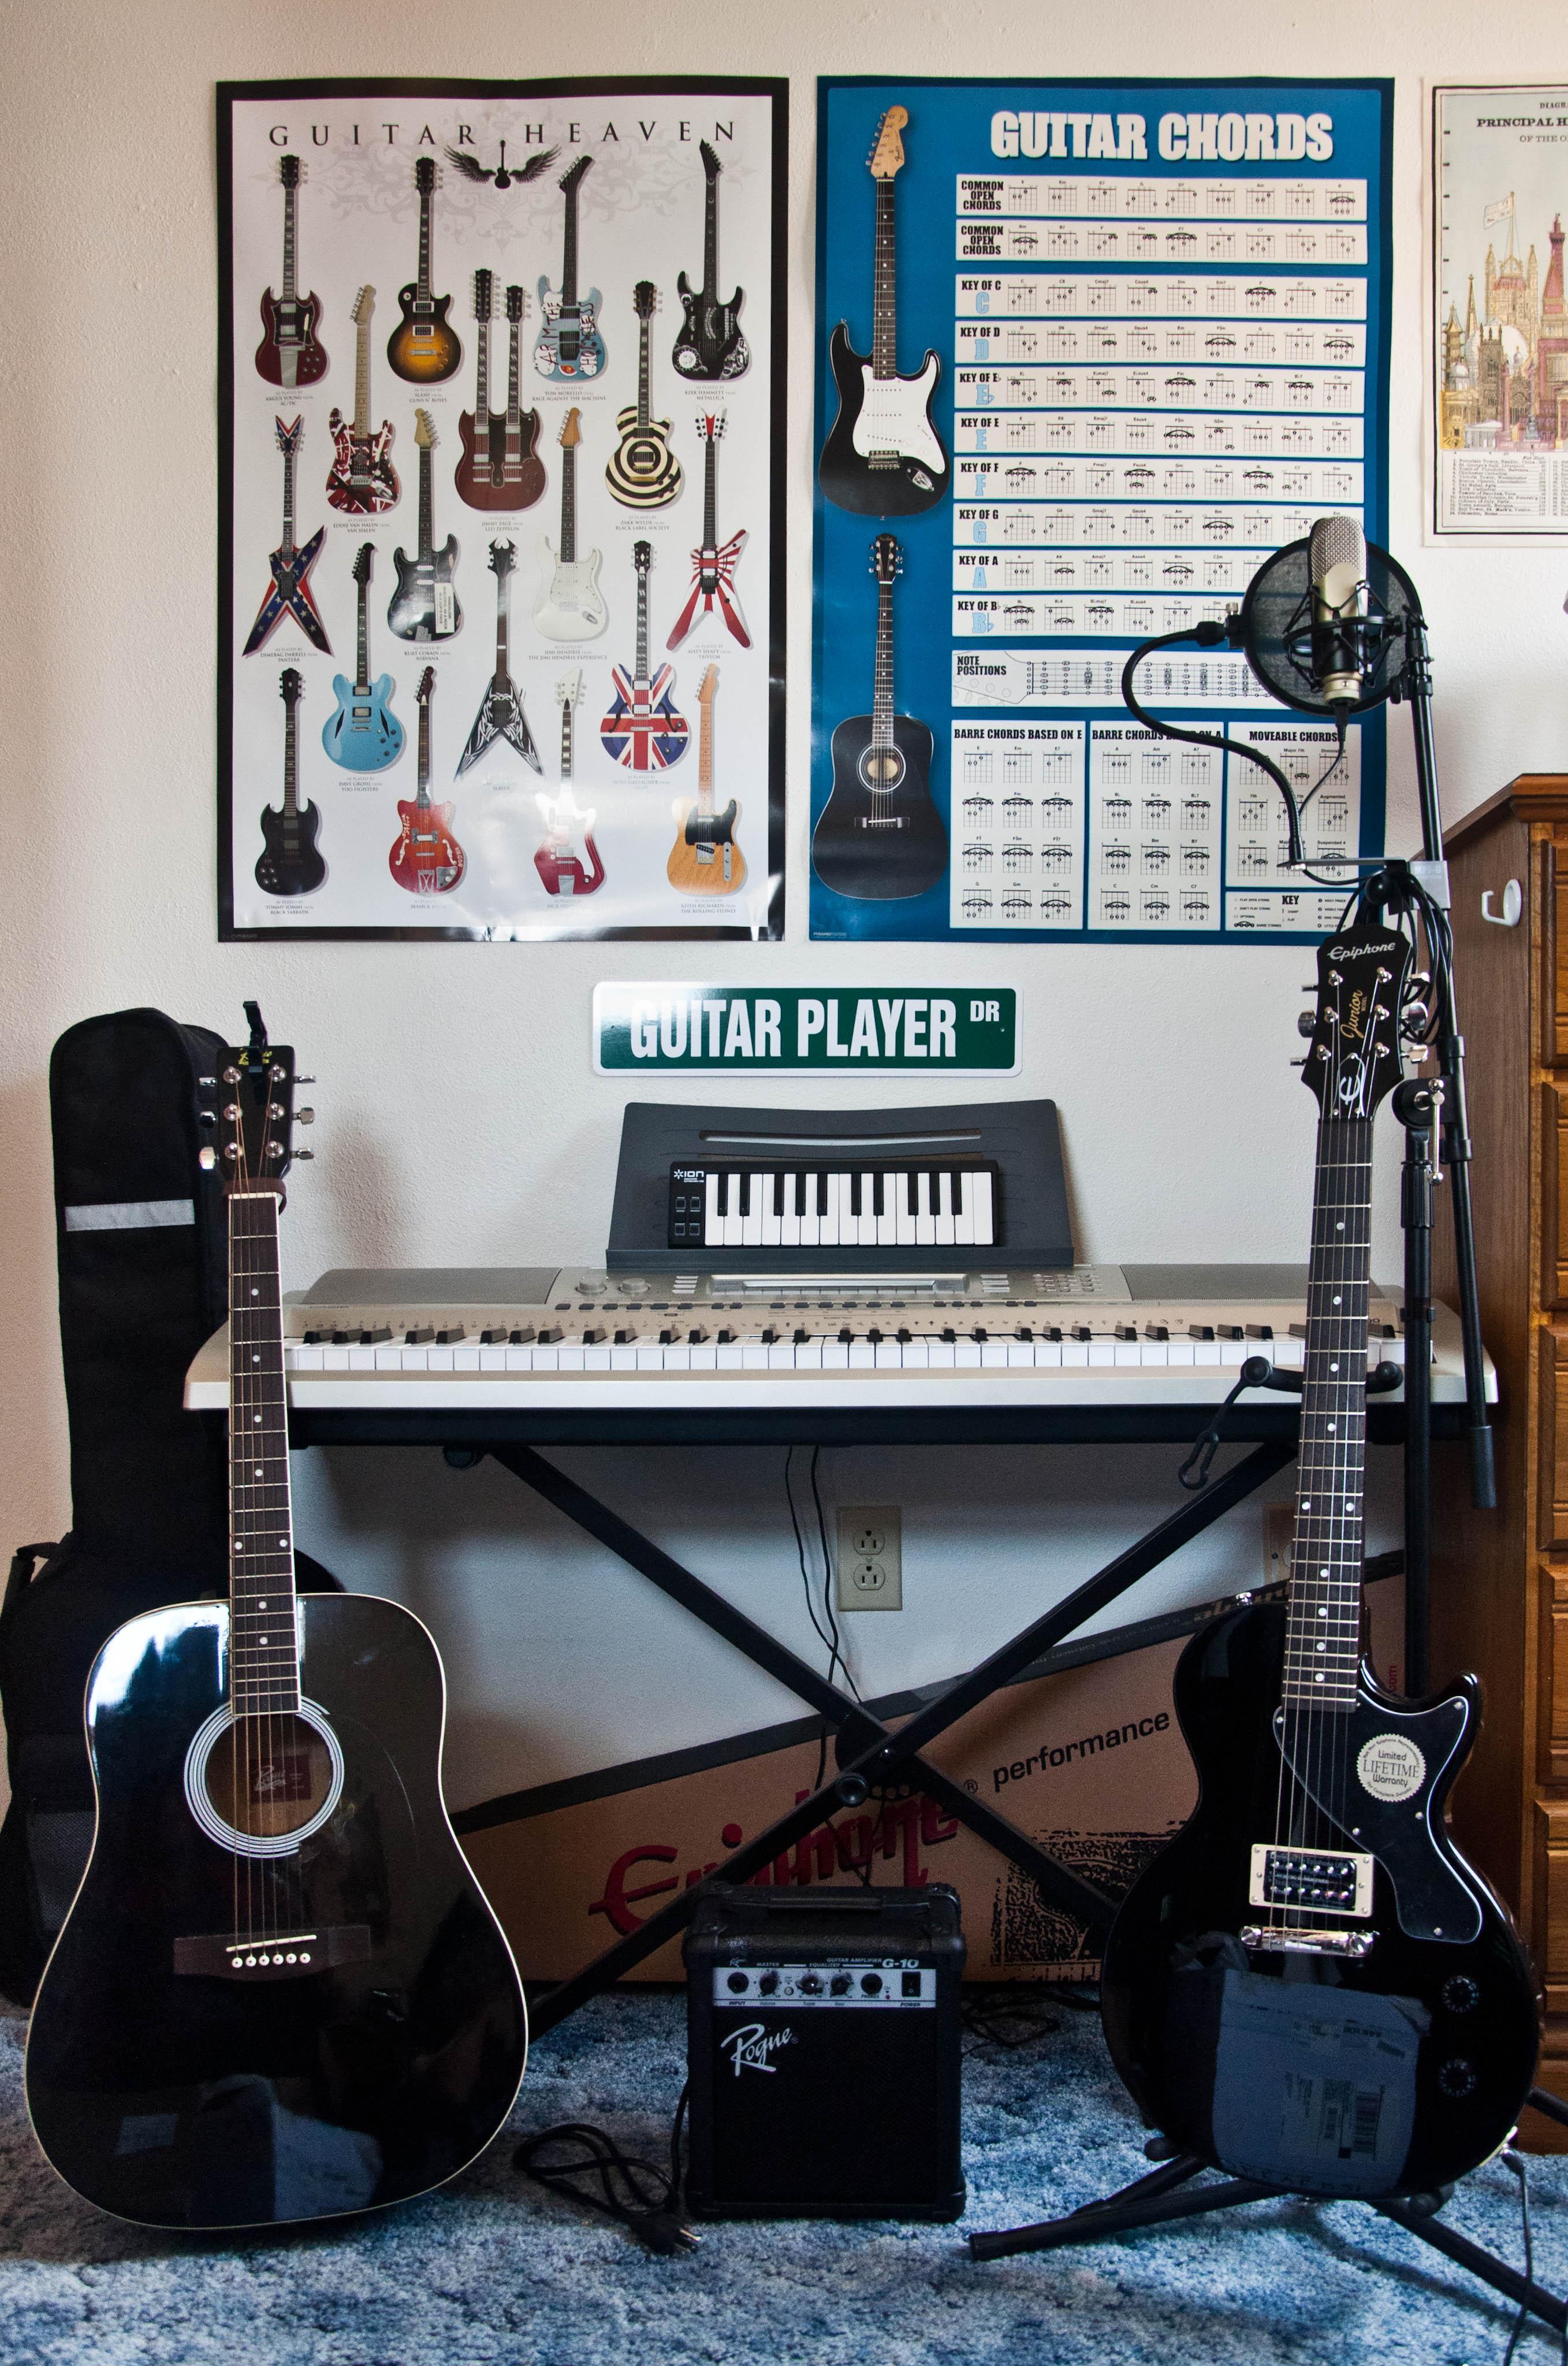 Guitar Chord Charts: Boonlee897s home studio.jpg - Wikimedia Commons,Chart